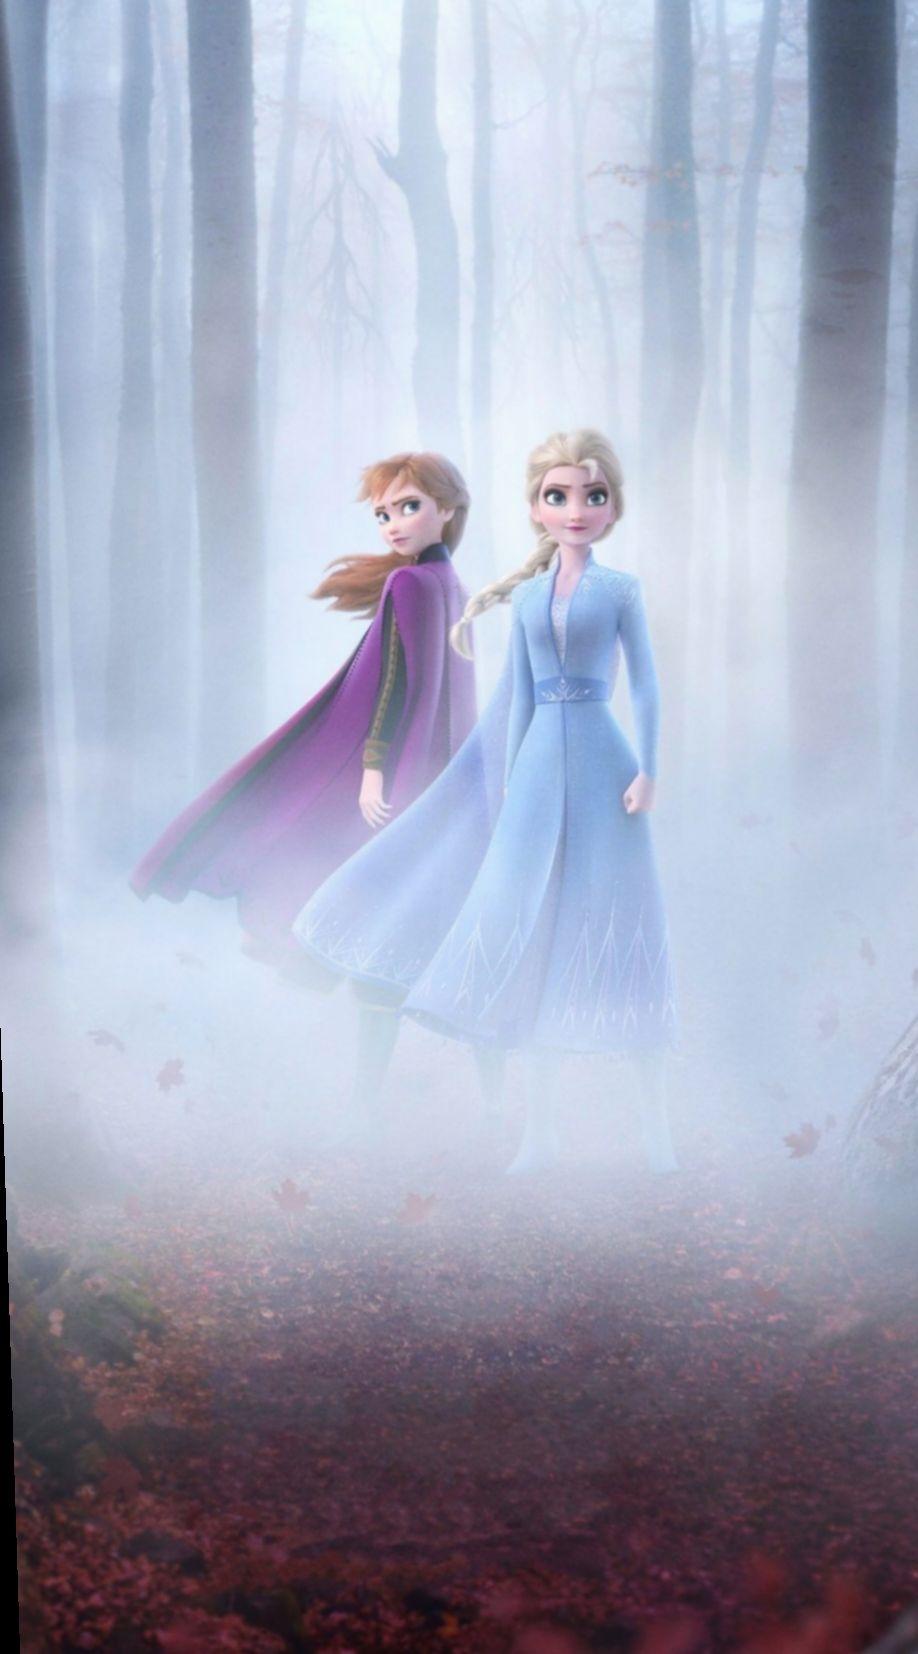 Cute Wallpapers Disney Frozen Princess Modainfantil Mosakids Disney Princess Frozen Frozen Pictures Frozen 2 Wallpaper